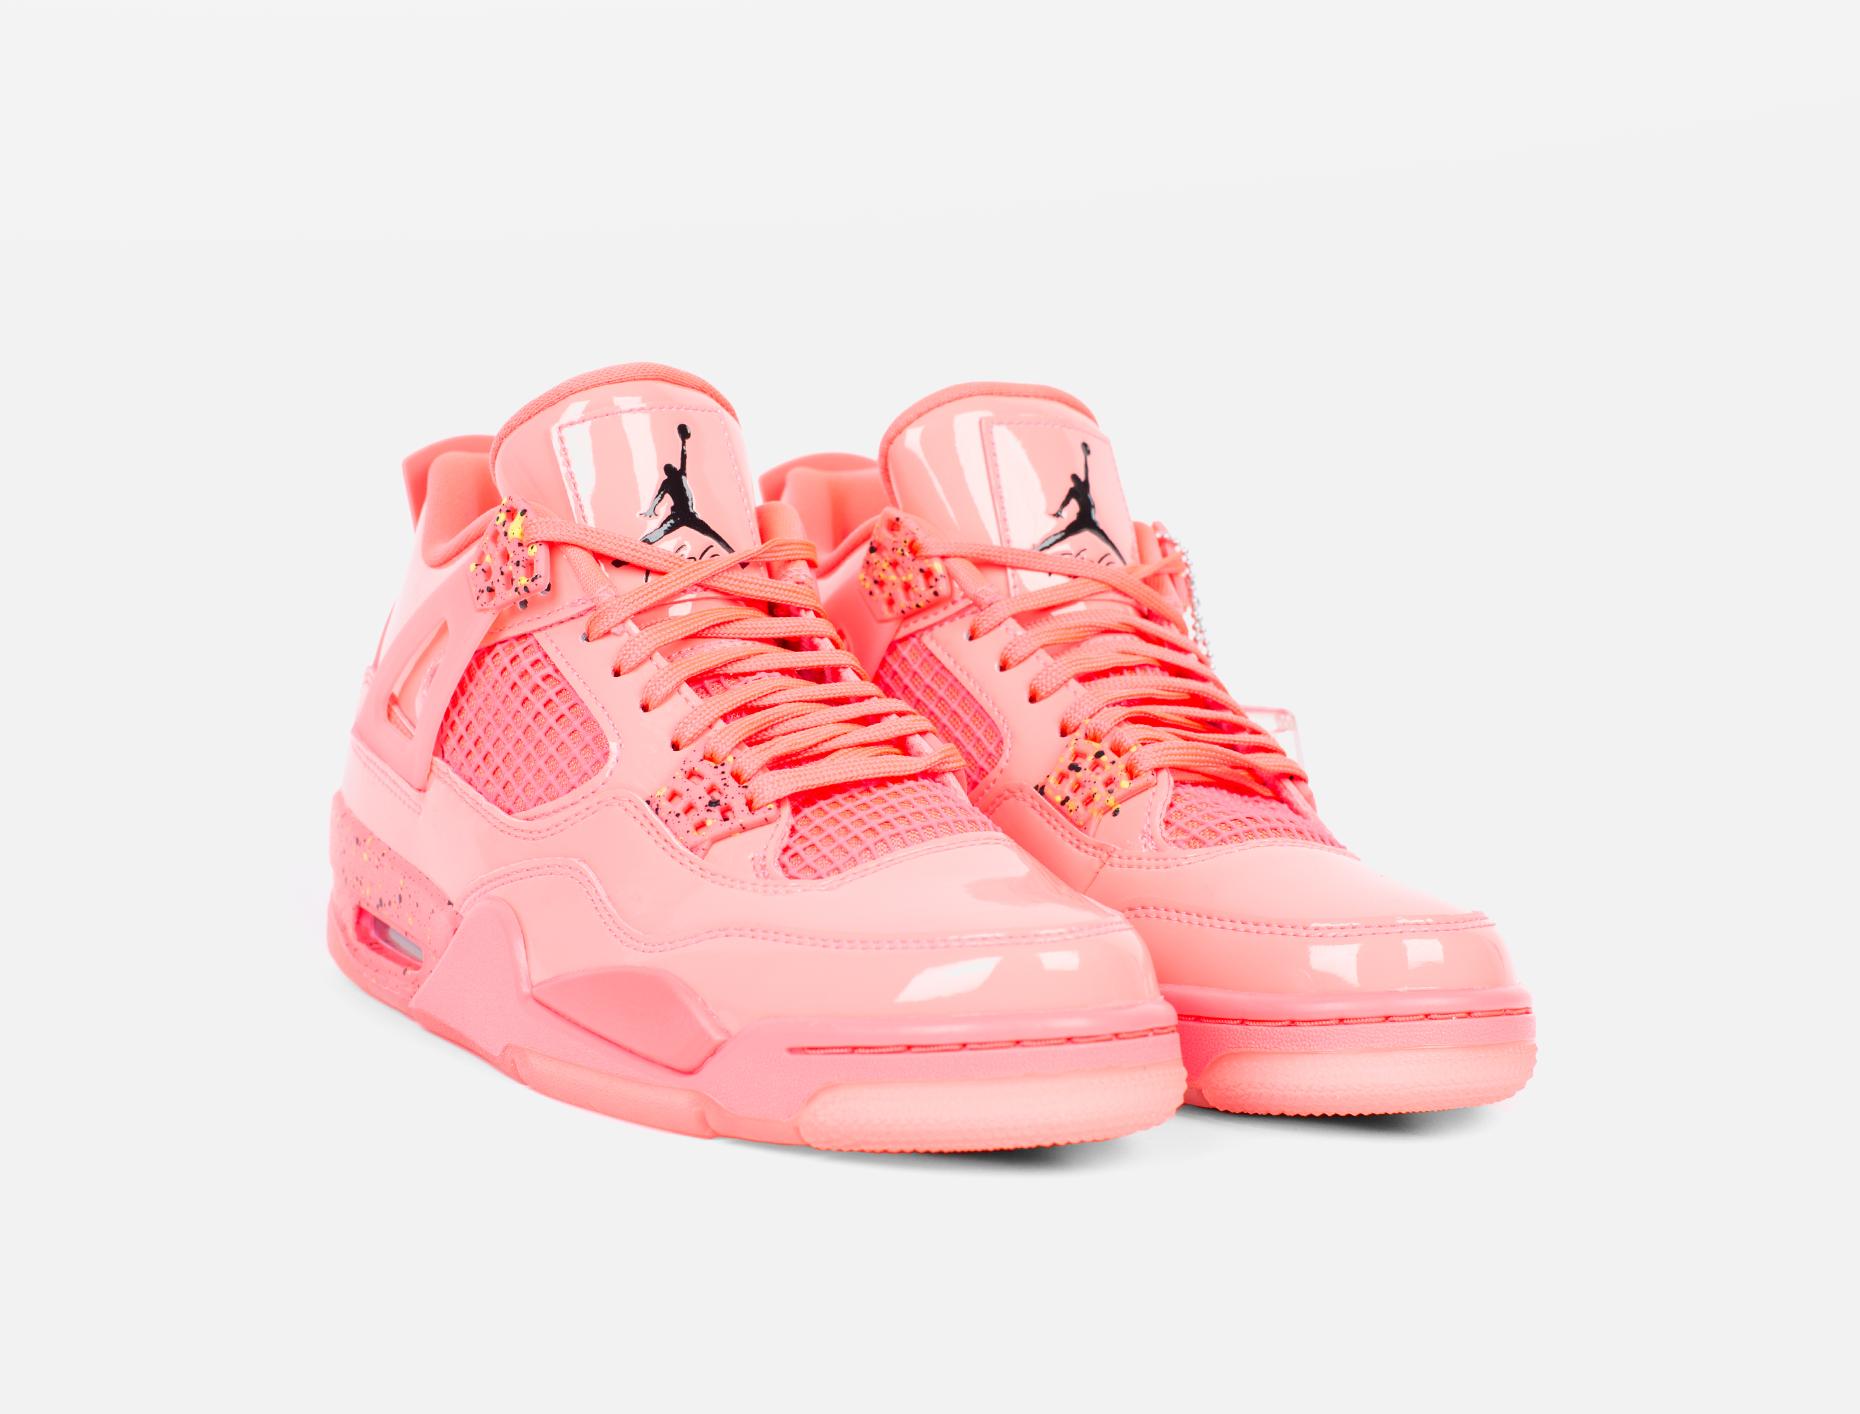 1e4ad2b79d6067 ... Preview  Air Jordan 4 Retro NRG Sneaker ...